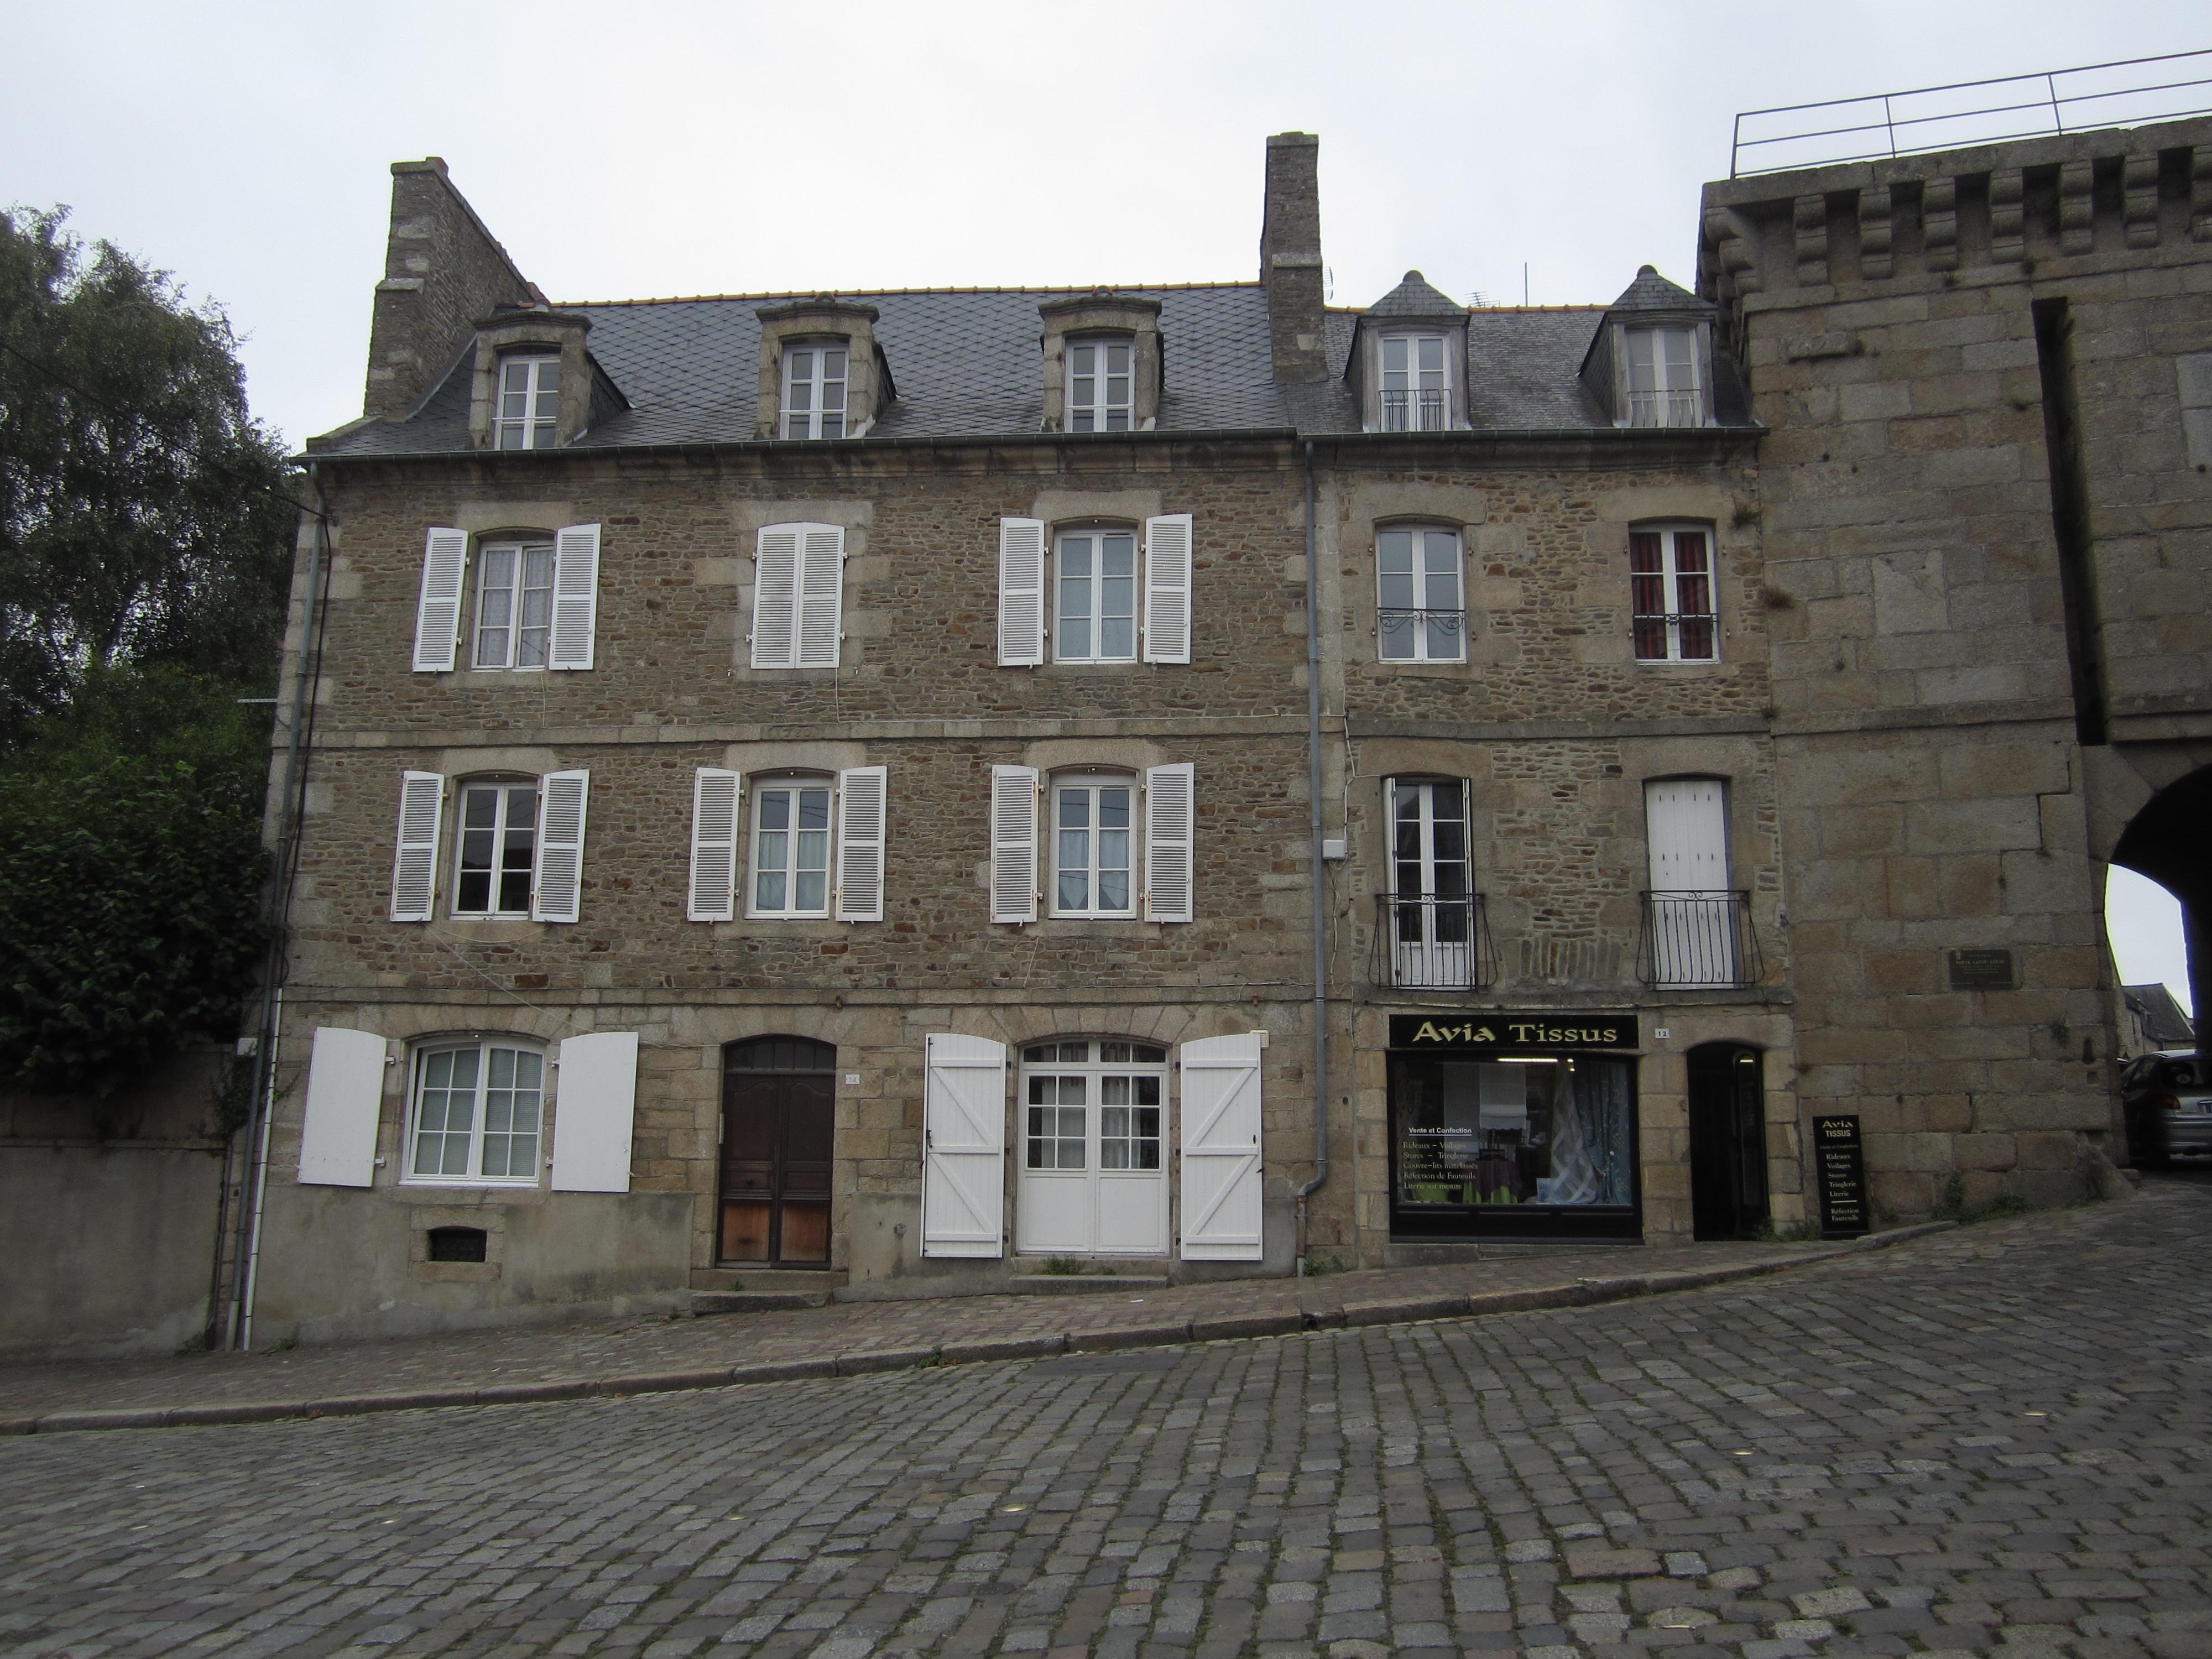 Vente De Tissus Brest april | 2013 | american girls art club in paris. . . and beyond